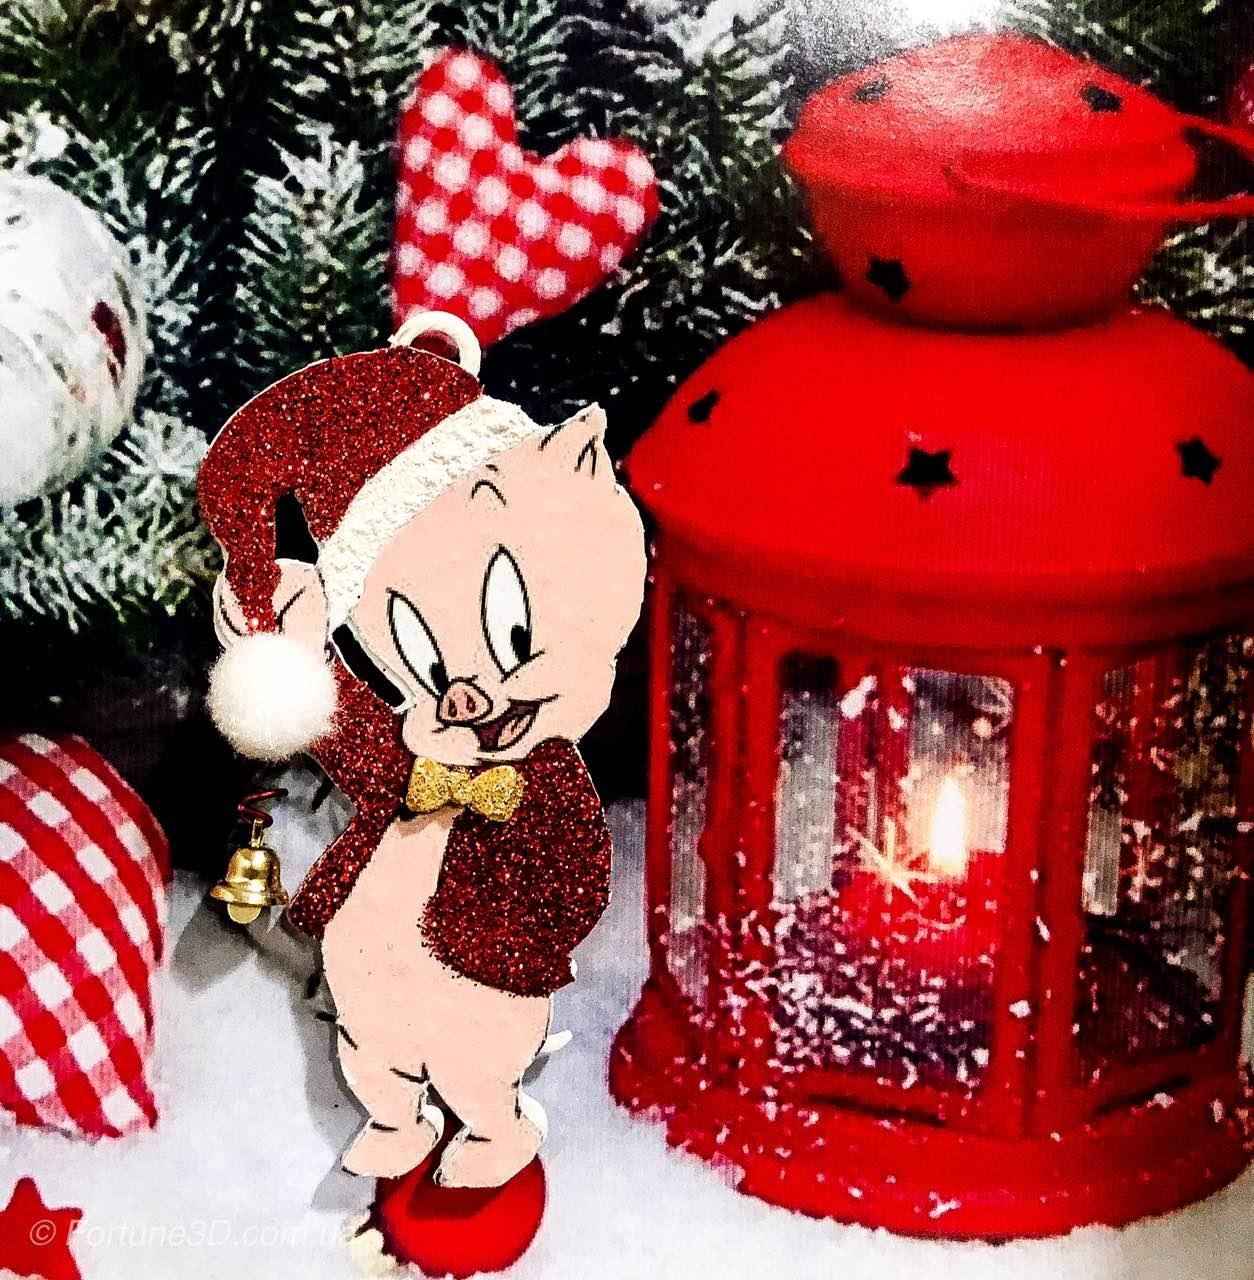 Игрушка на елку , символ 2019 года - Свинка с колокольчиком. Porky Pig на ёлку